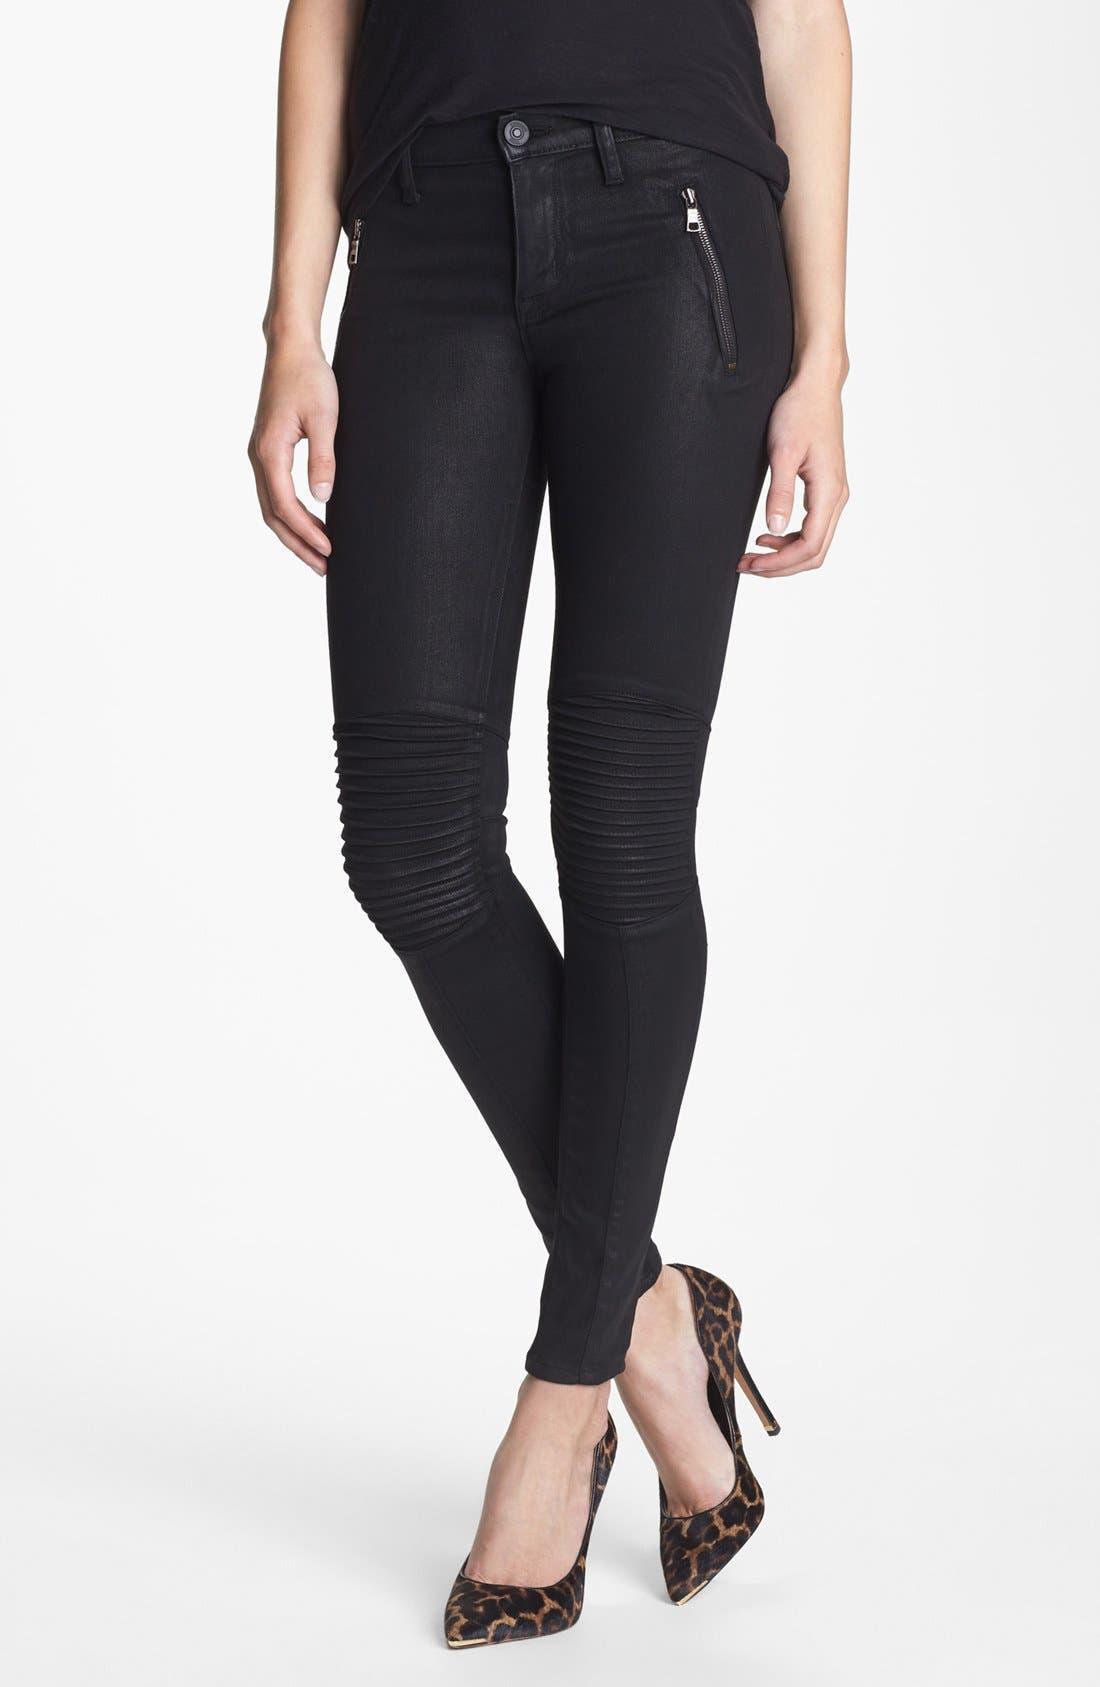 Main Image - Hudson Jeans 'Stark' Moto Skinny Jeans (Jet Black)